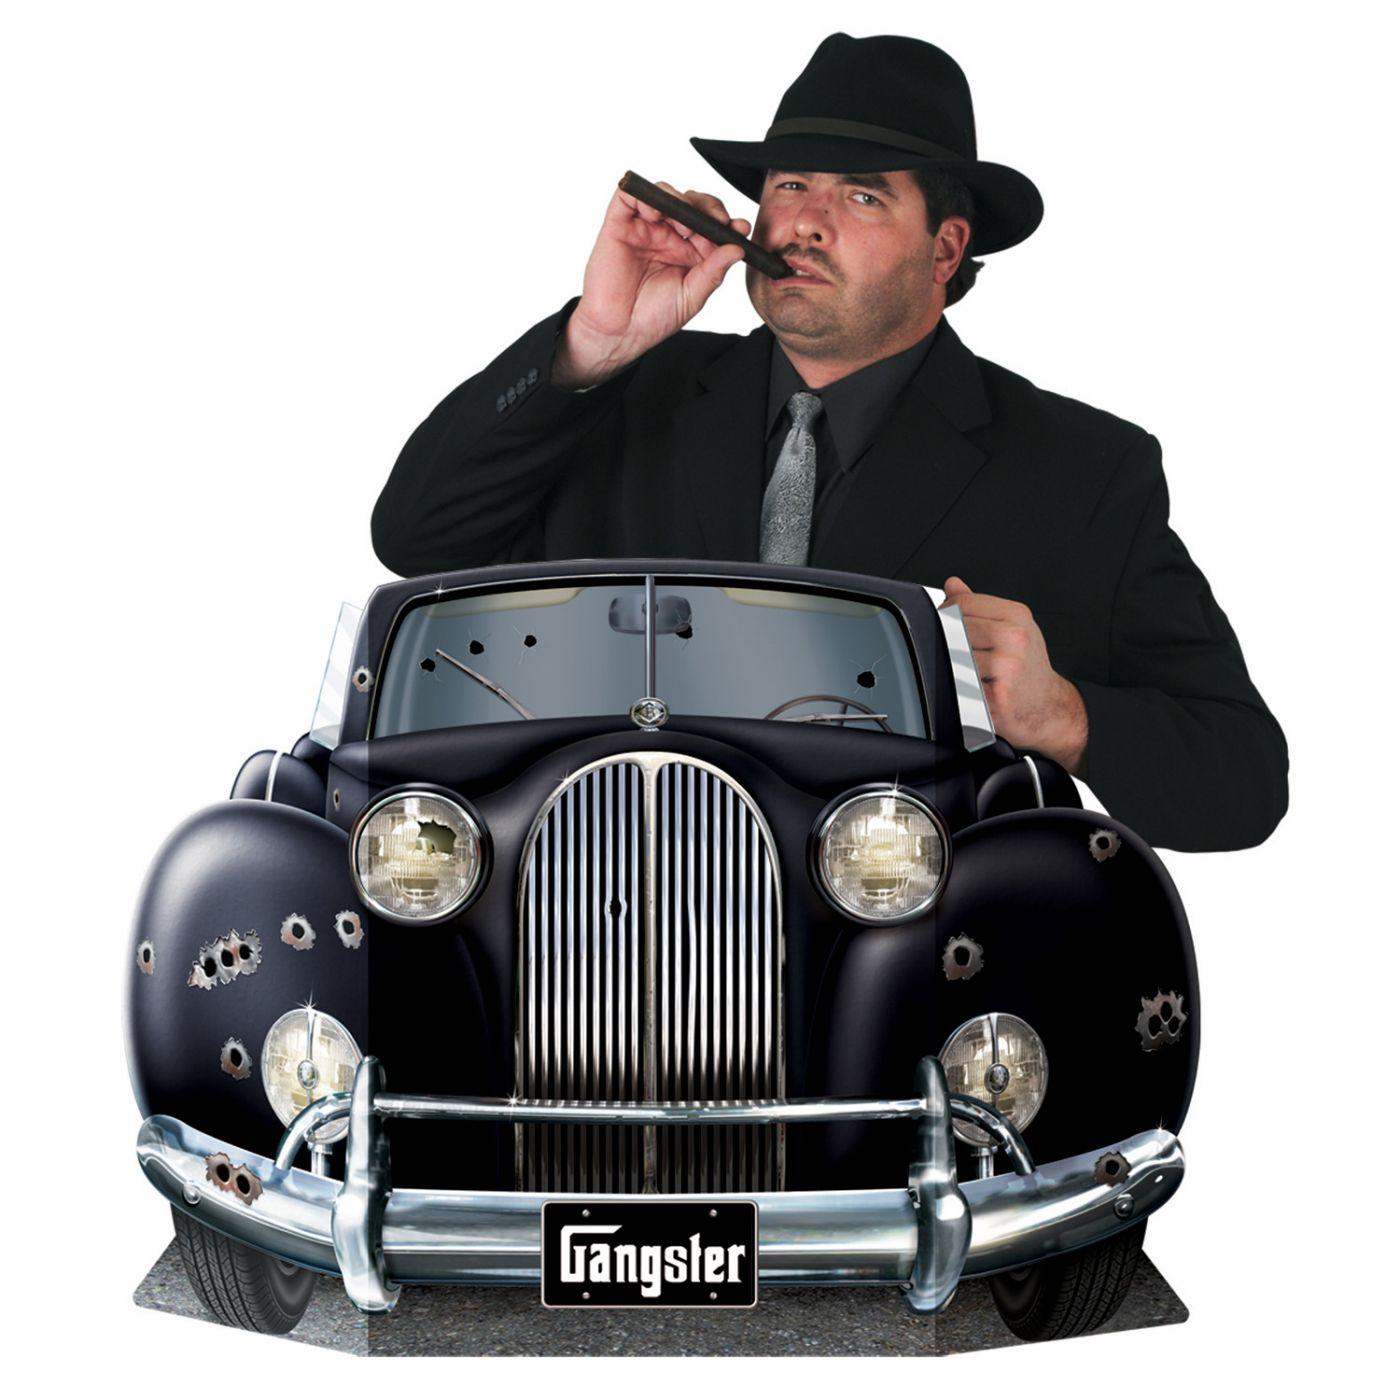 Gangster Car Photo Prop (6) image